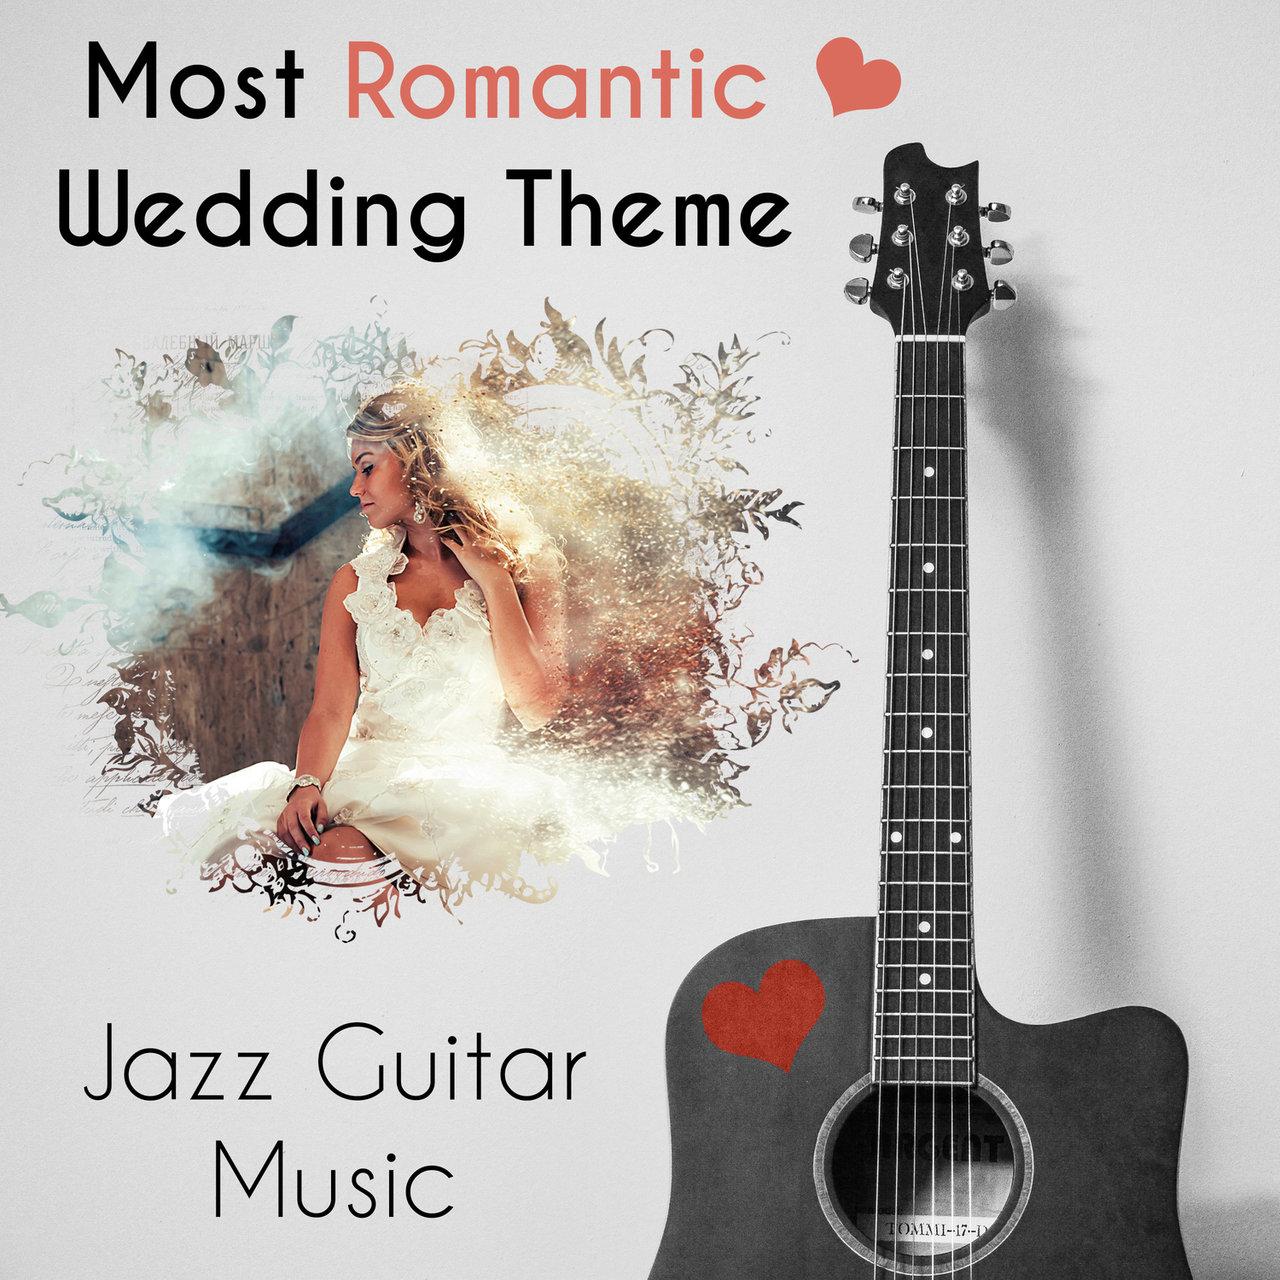 TIDAL: Listen to Wedding Music Zone on TIDAL